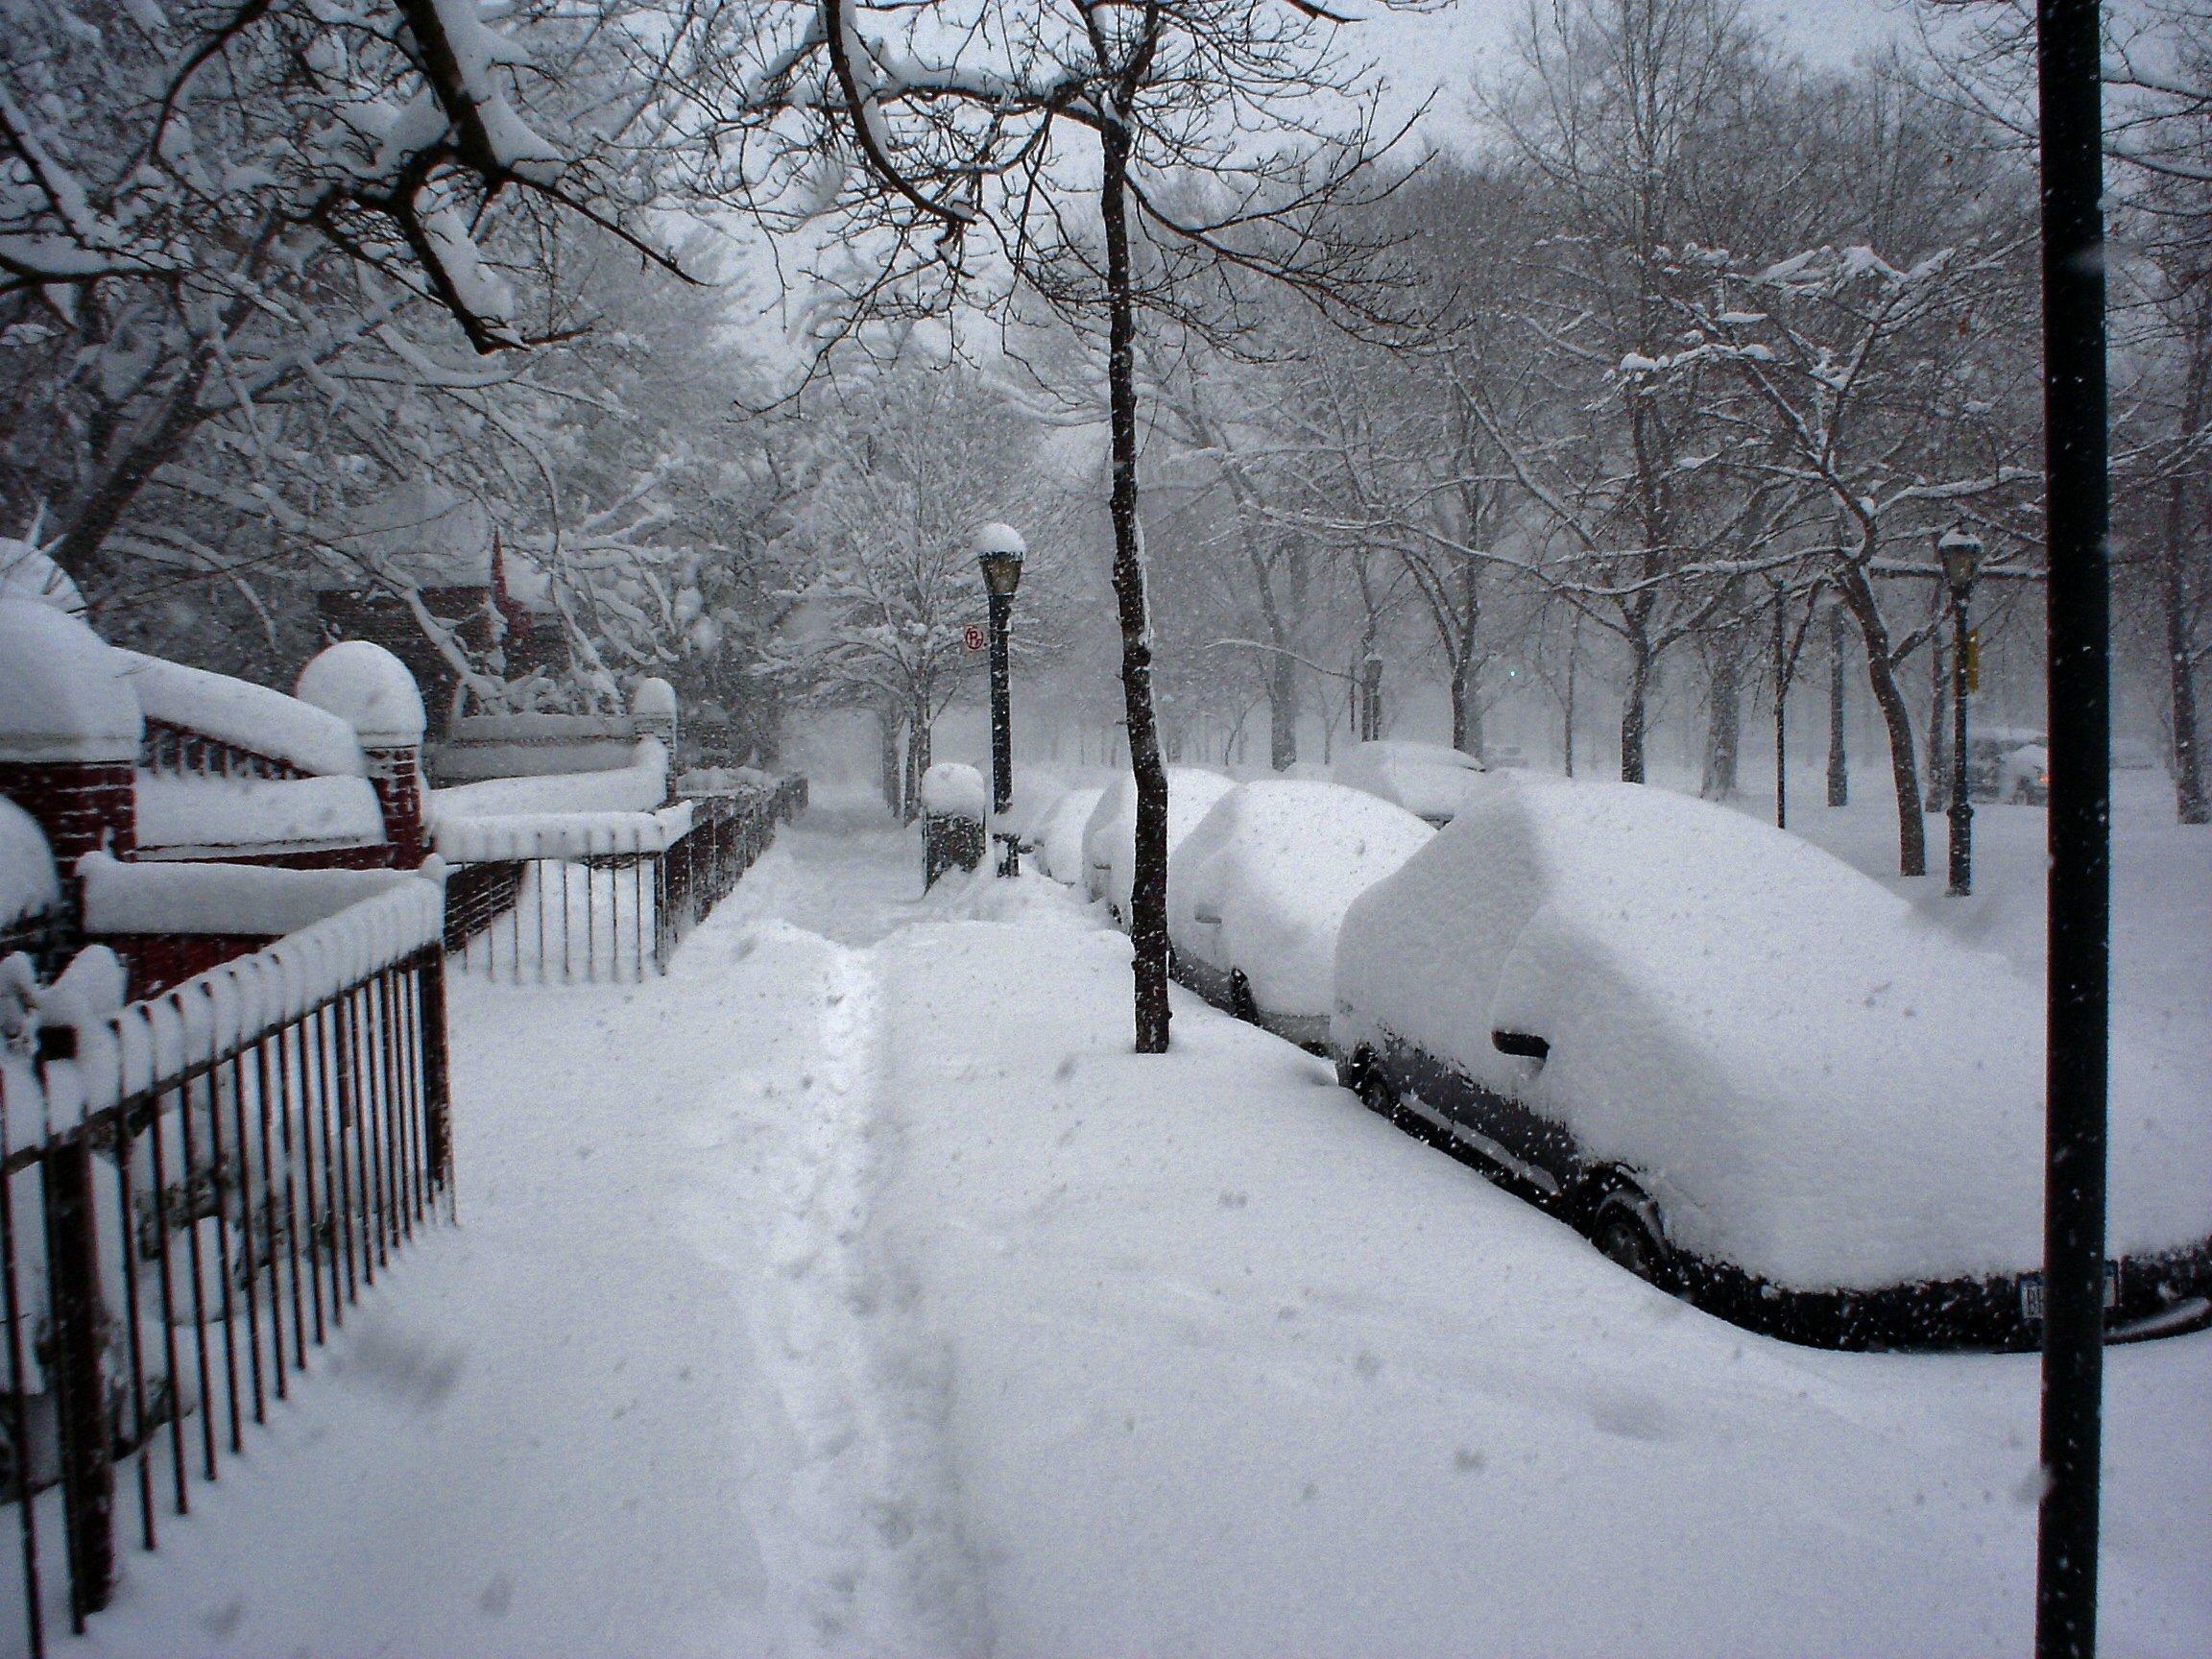 Snow in Australia